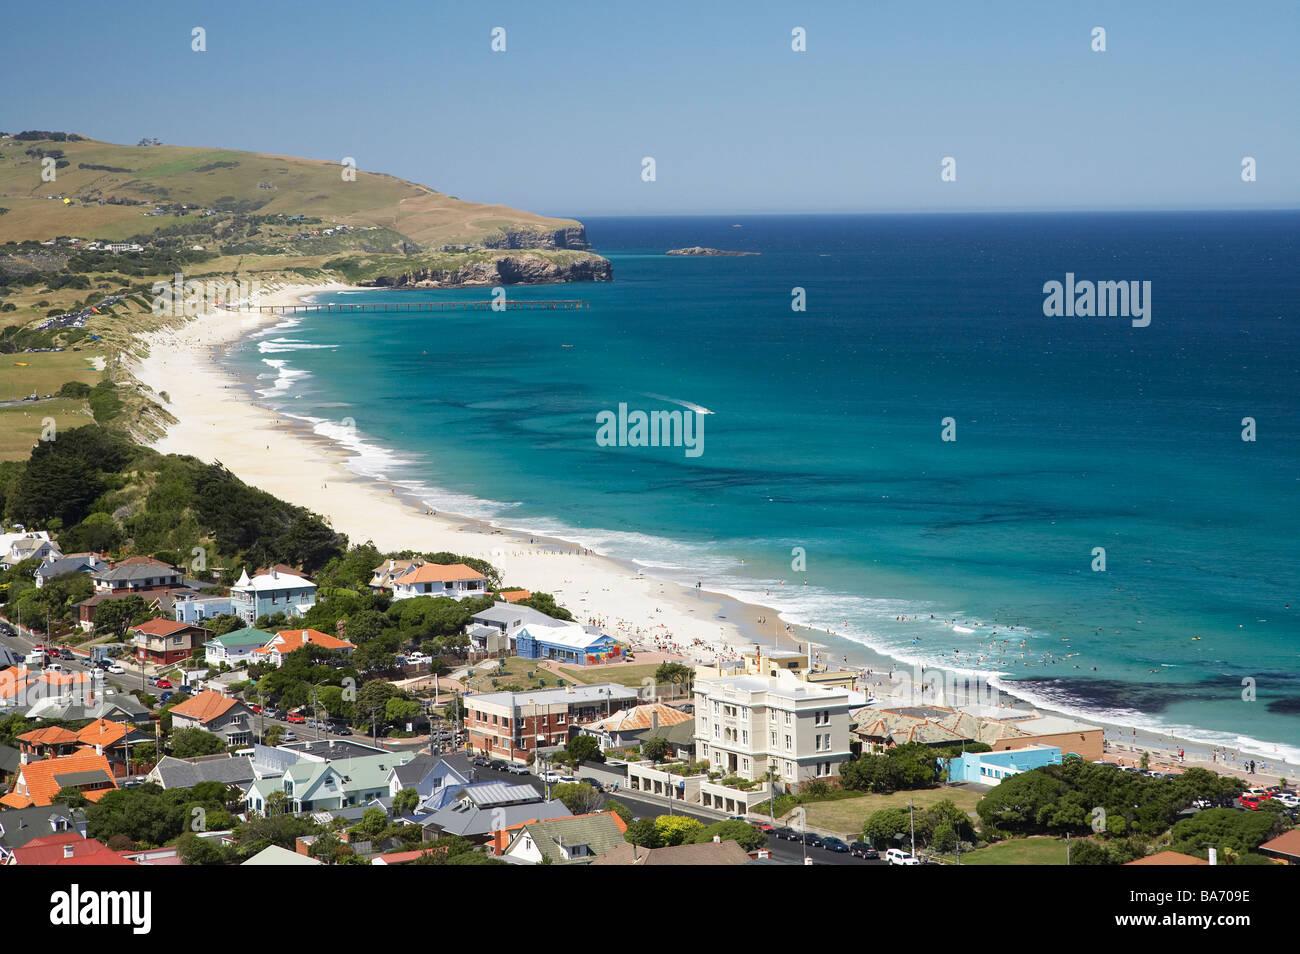 St. Kilda und St Clair Strände Dunedin Otago Süd-Insel Neuseeland Stockbild